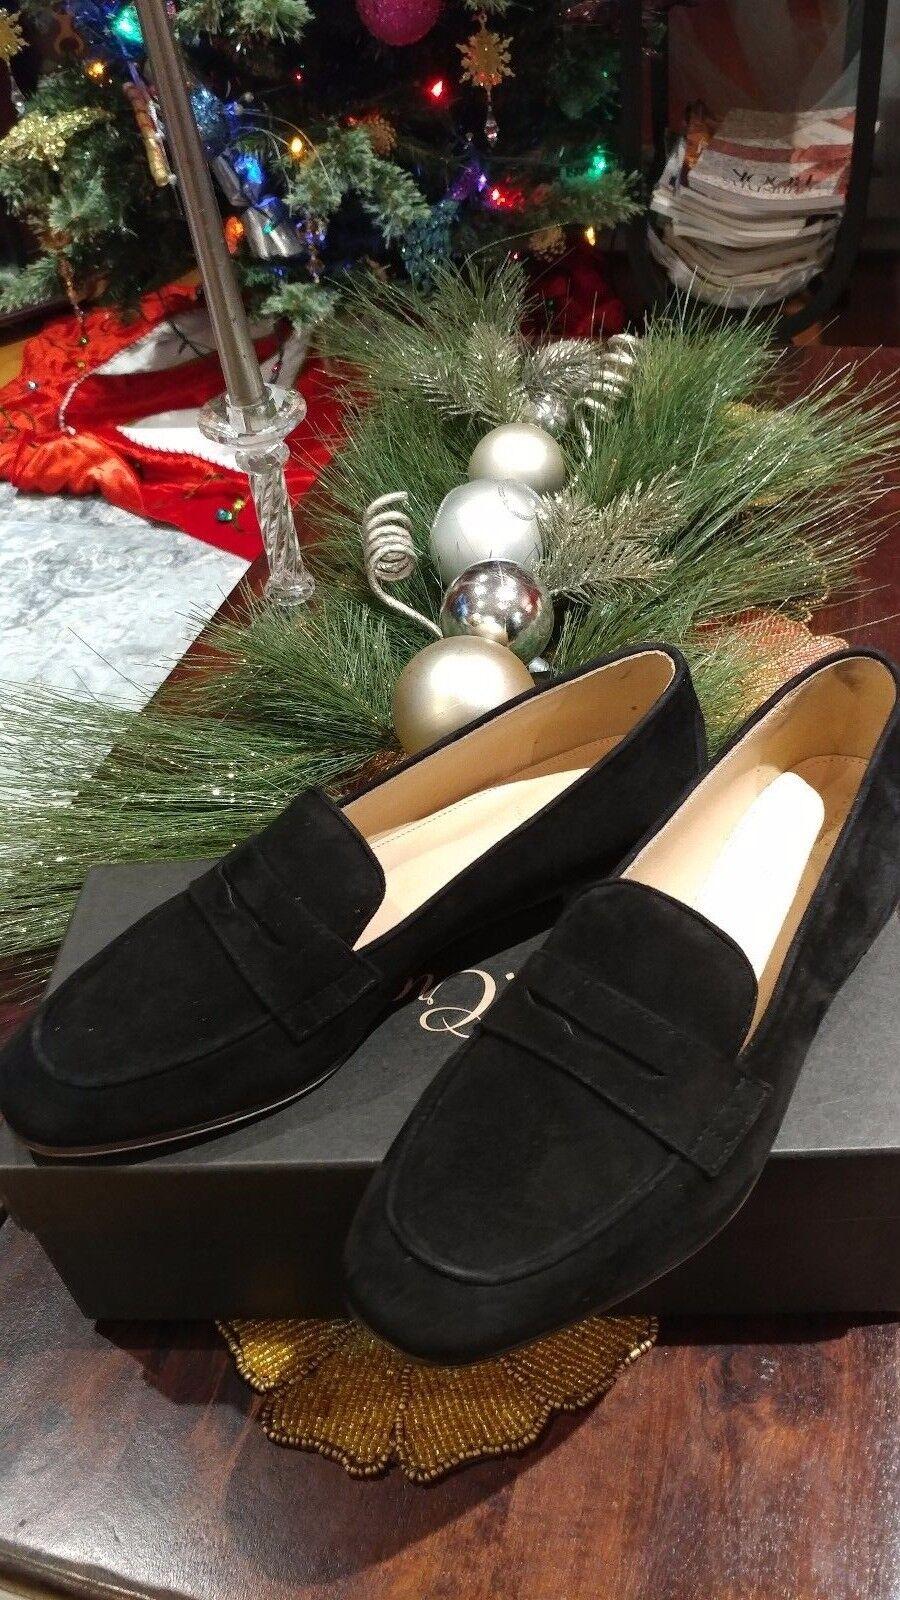 J.Crew Black Suede  New Women  shoes  size  8